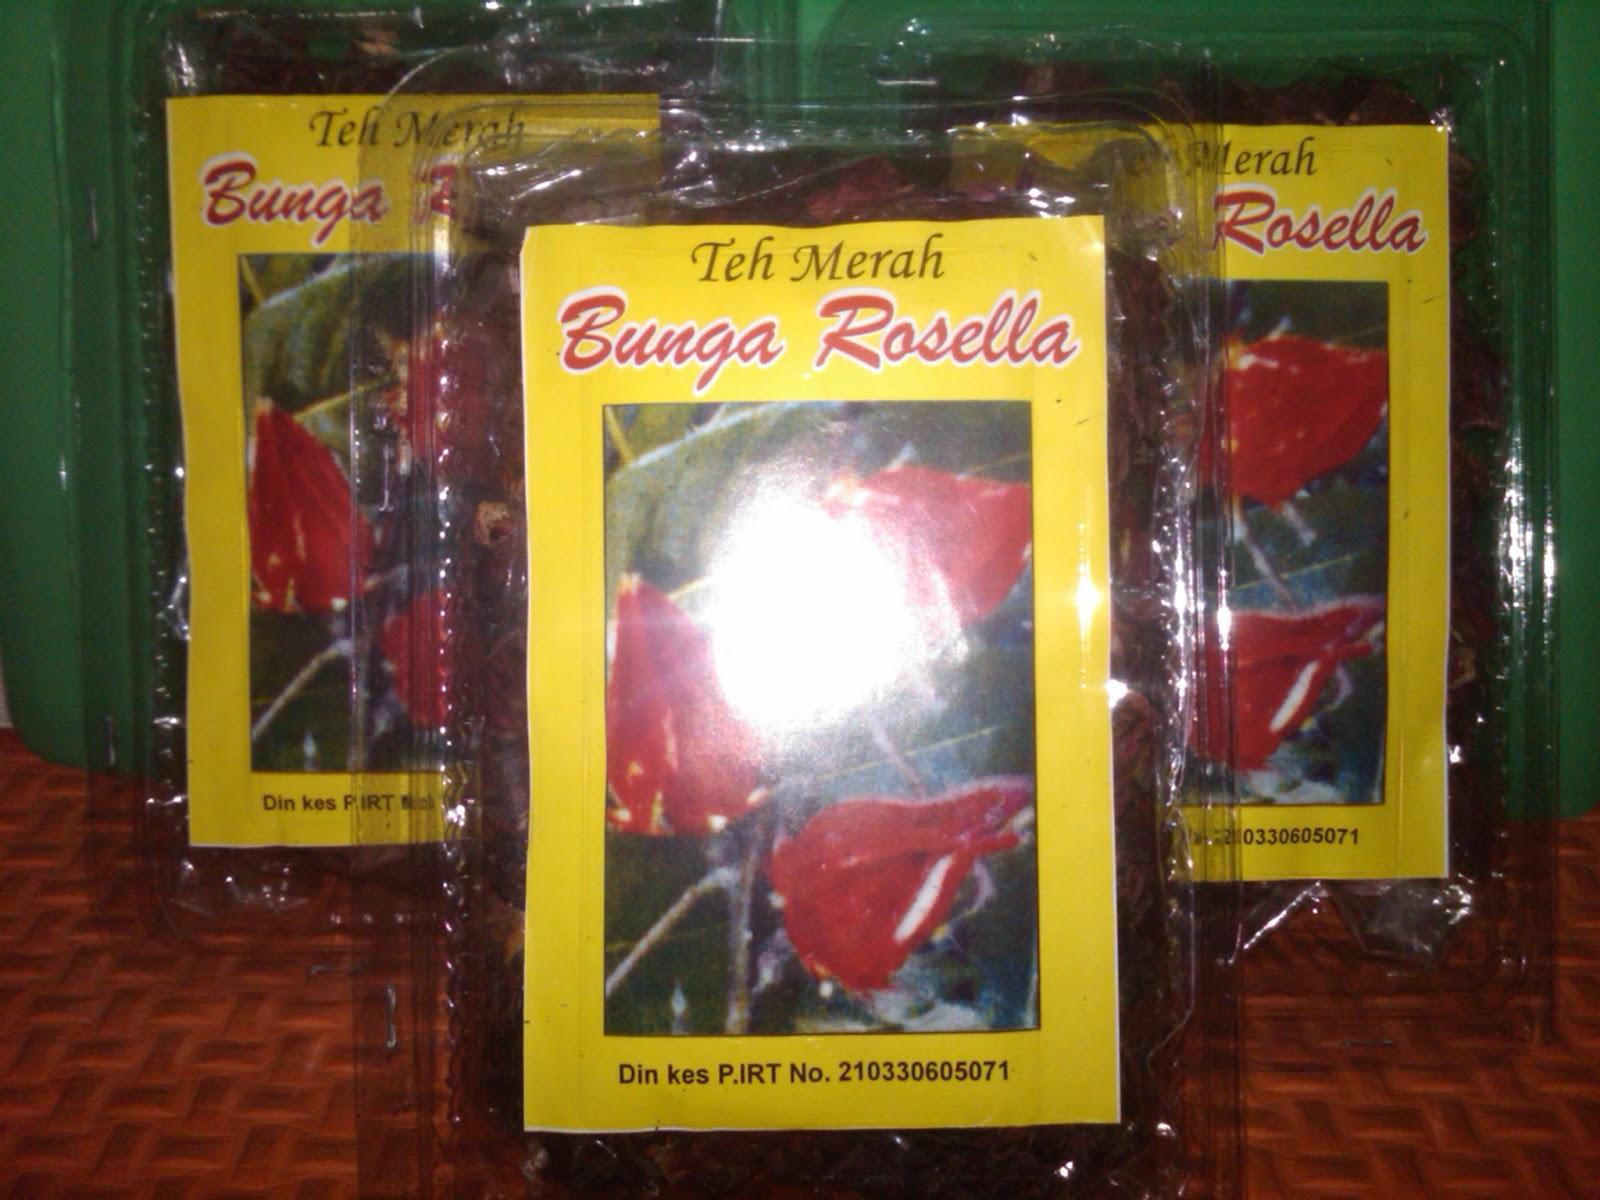 7 Khasiat Bunga Rosella Untuk Diet Aman Cepat Kurus Dalam Seminggu